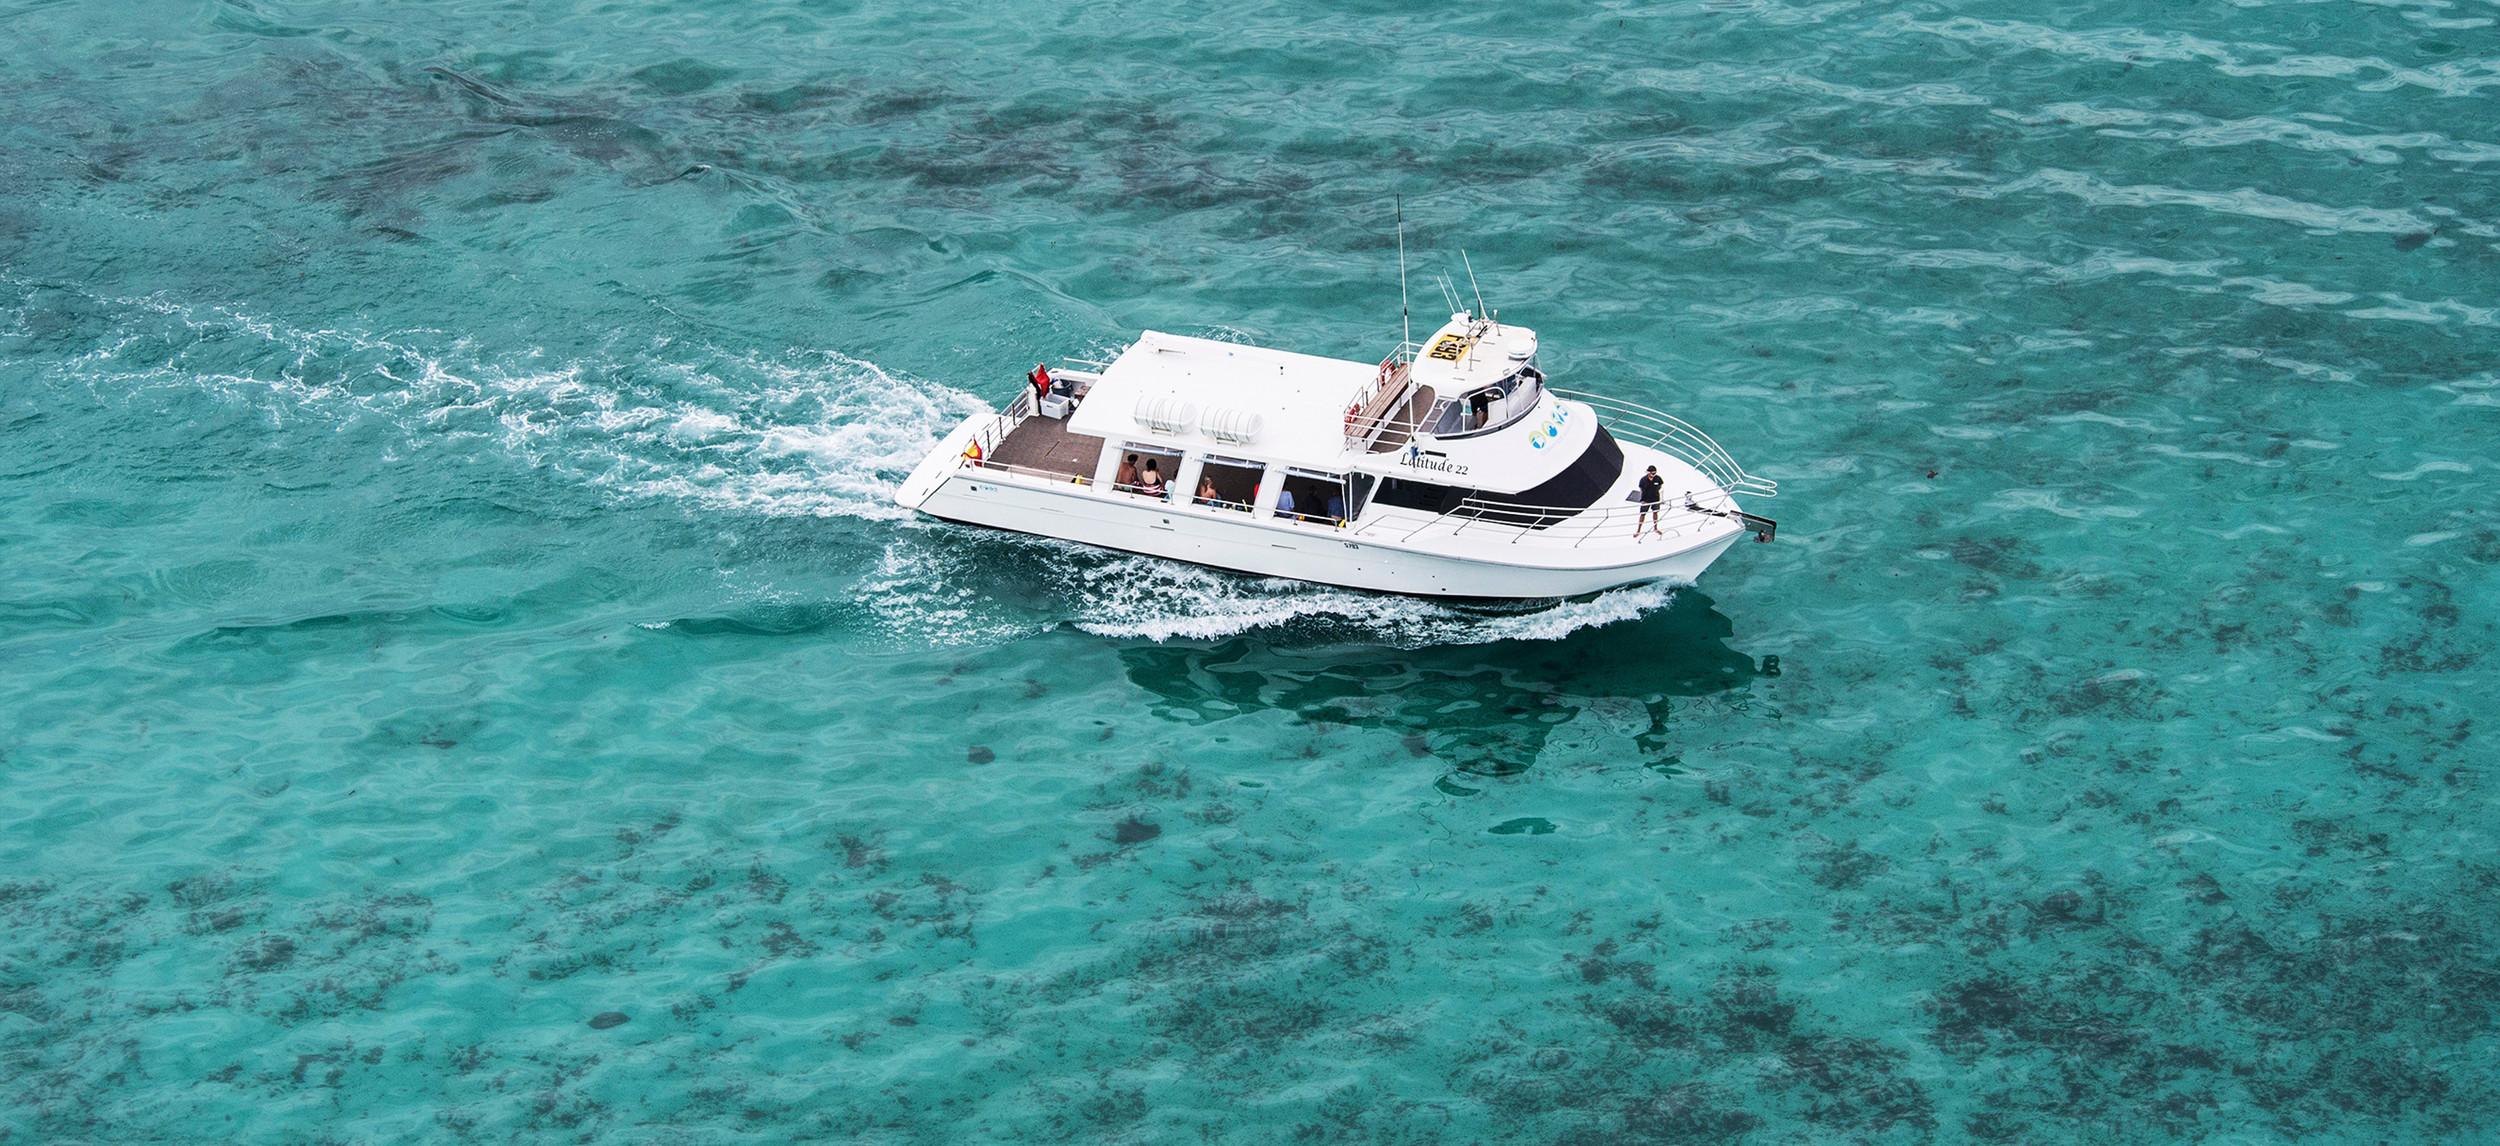 Whale Shark Tours Ningaloo Reef | Exmouth WA | Ocean Eco Adventures